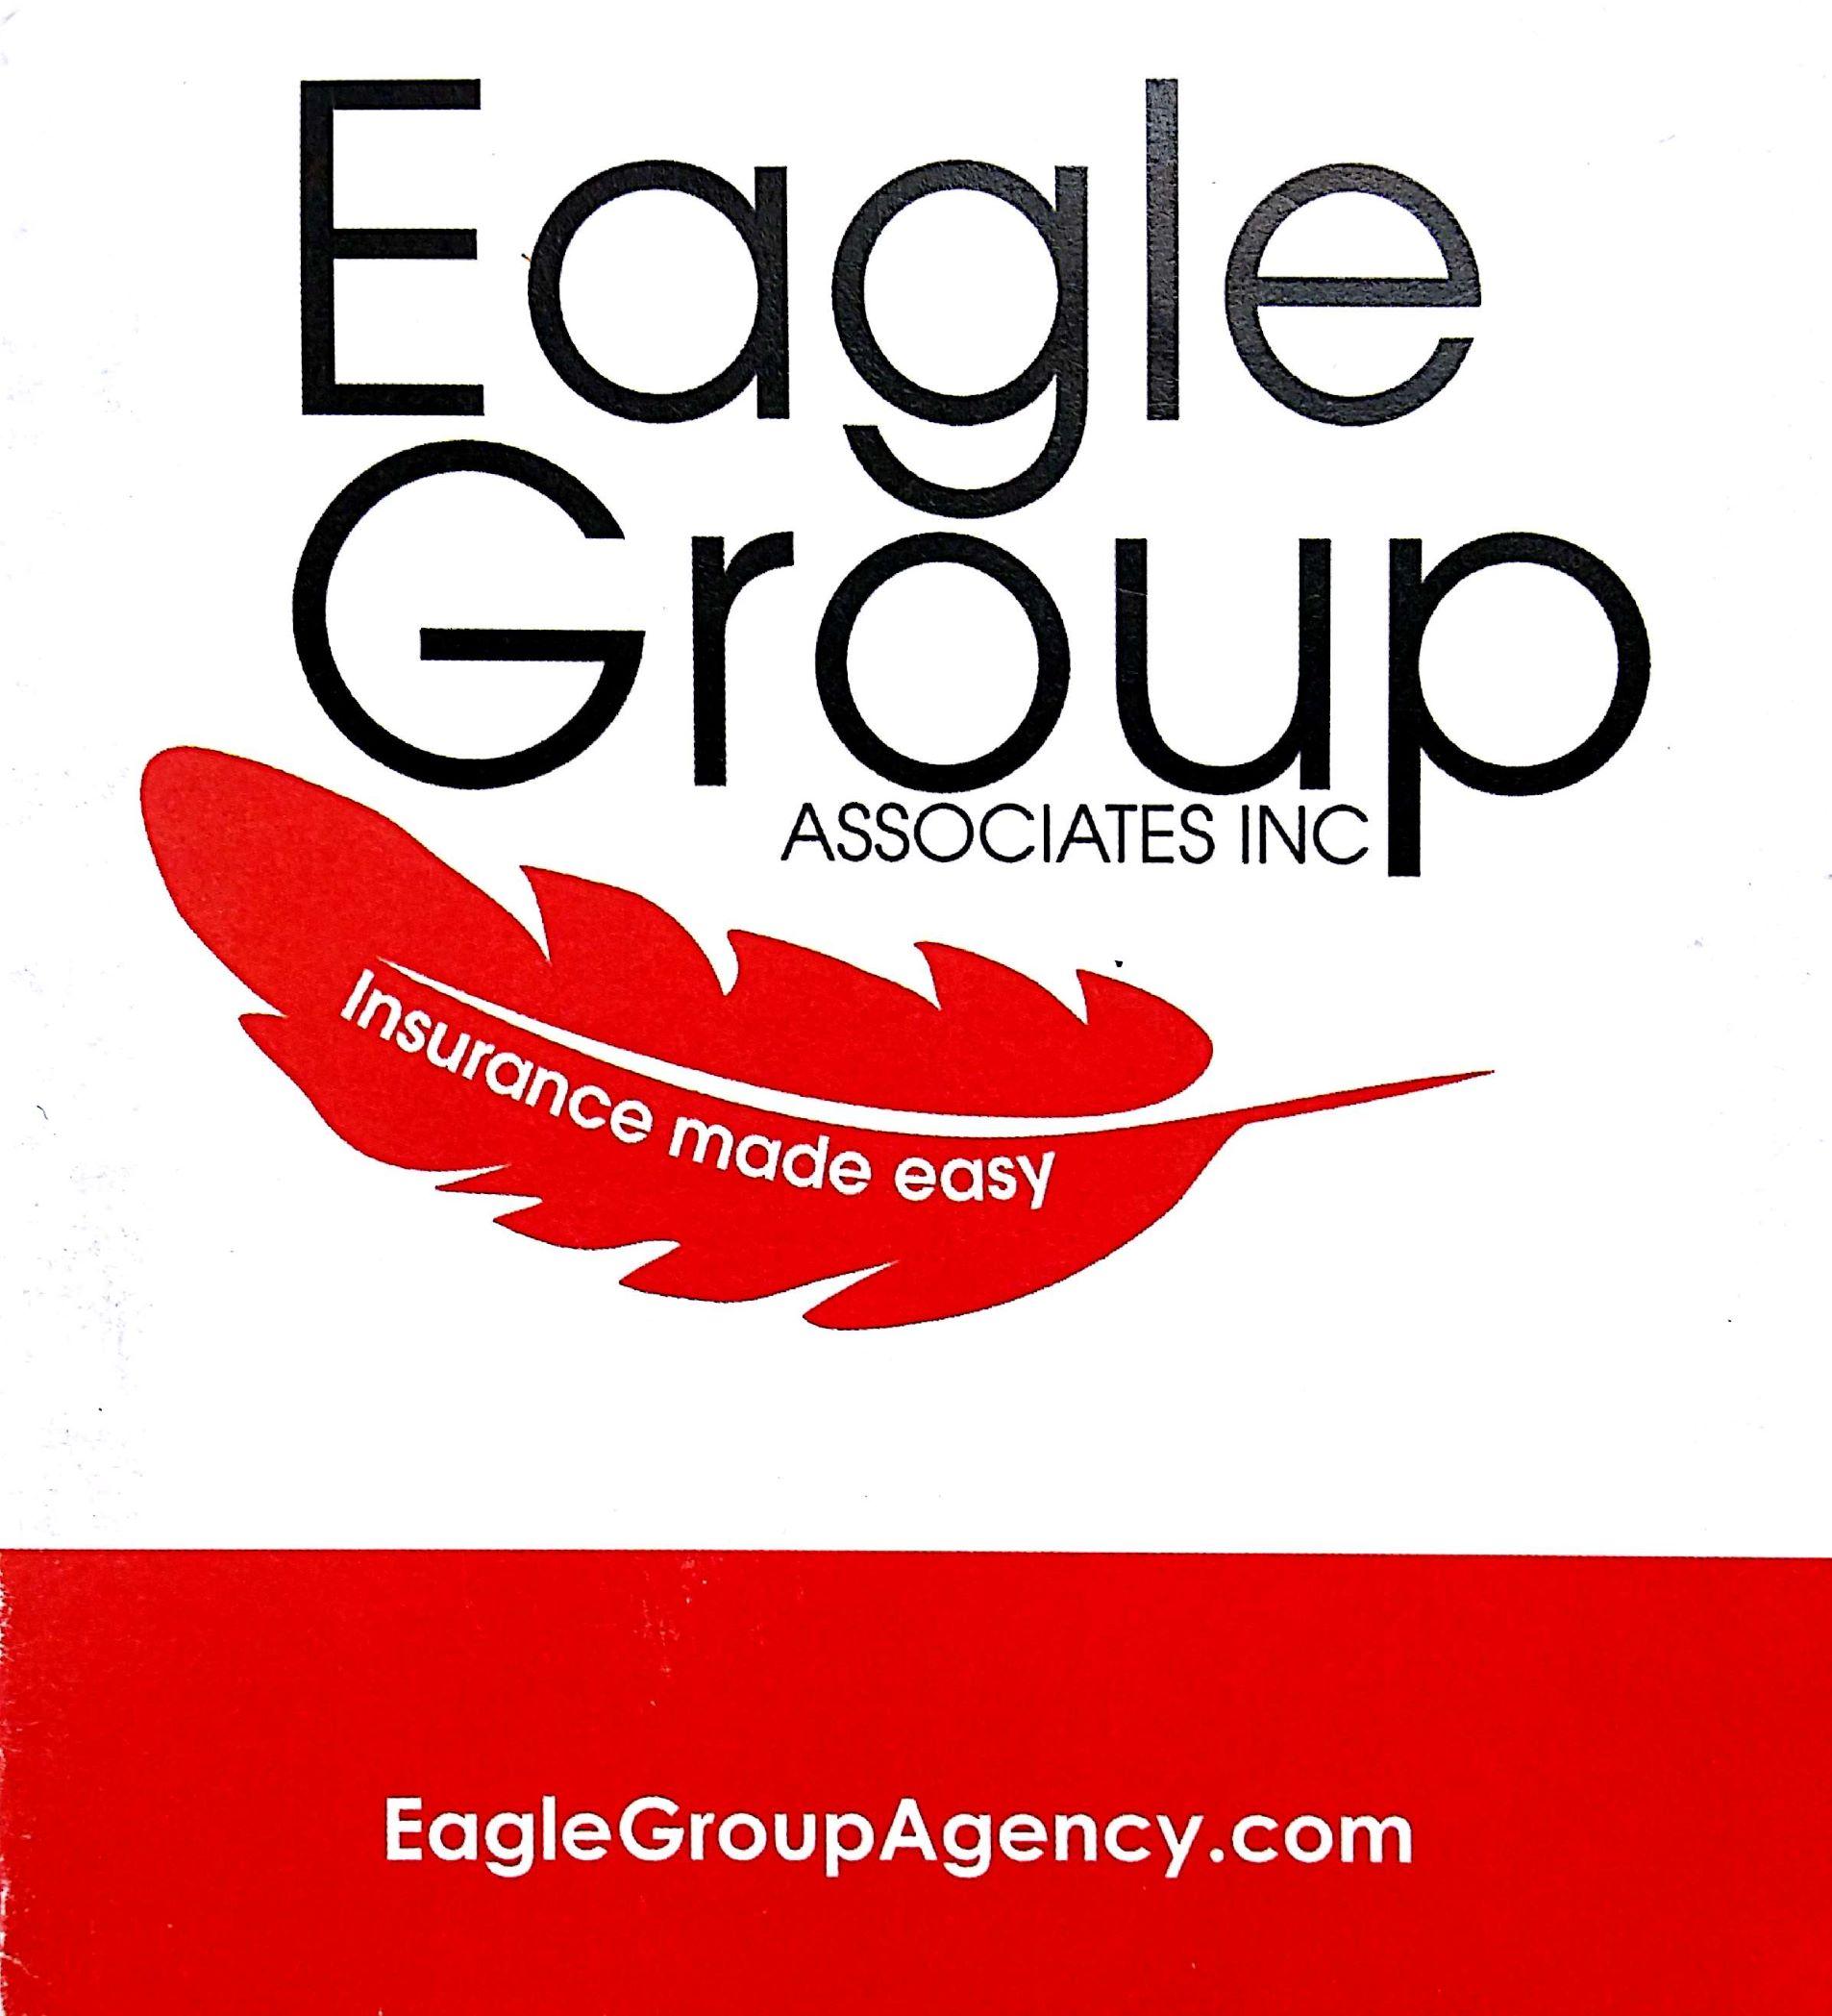 Eagle Group Associates Inc image 0